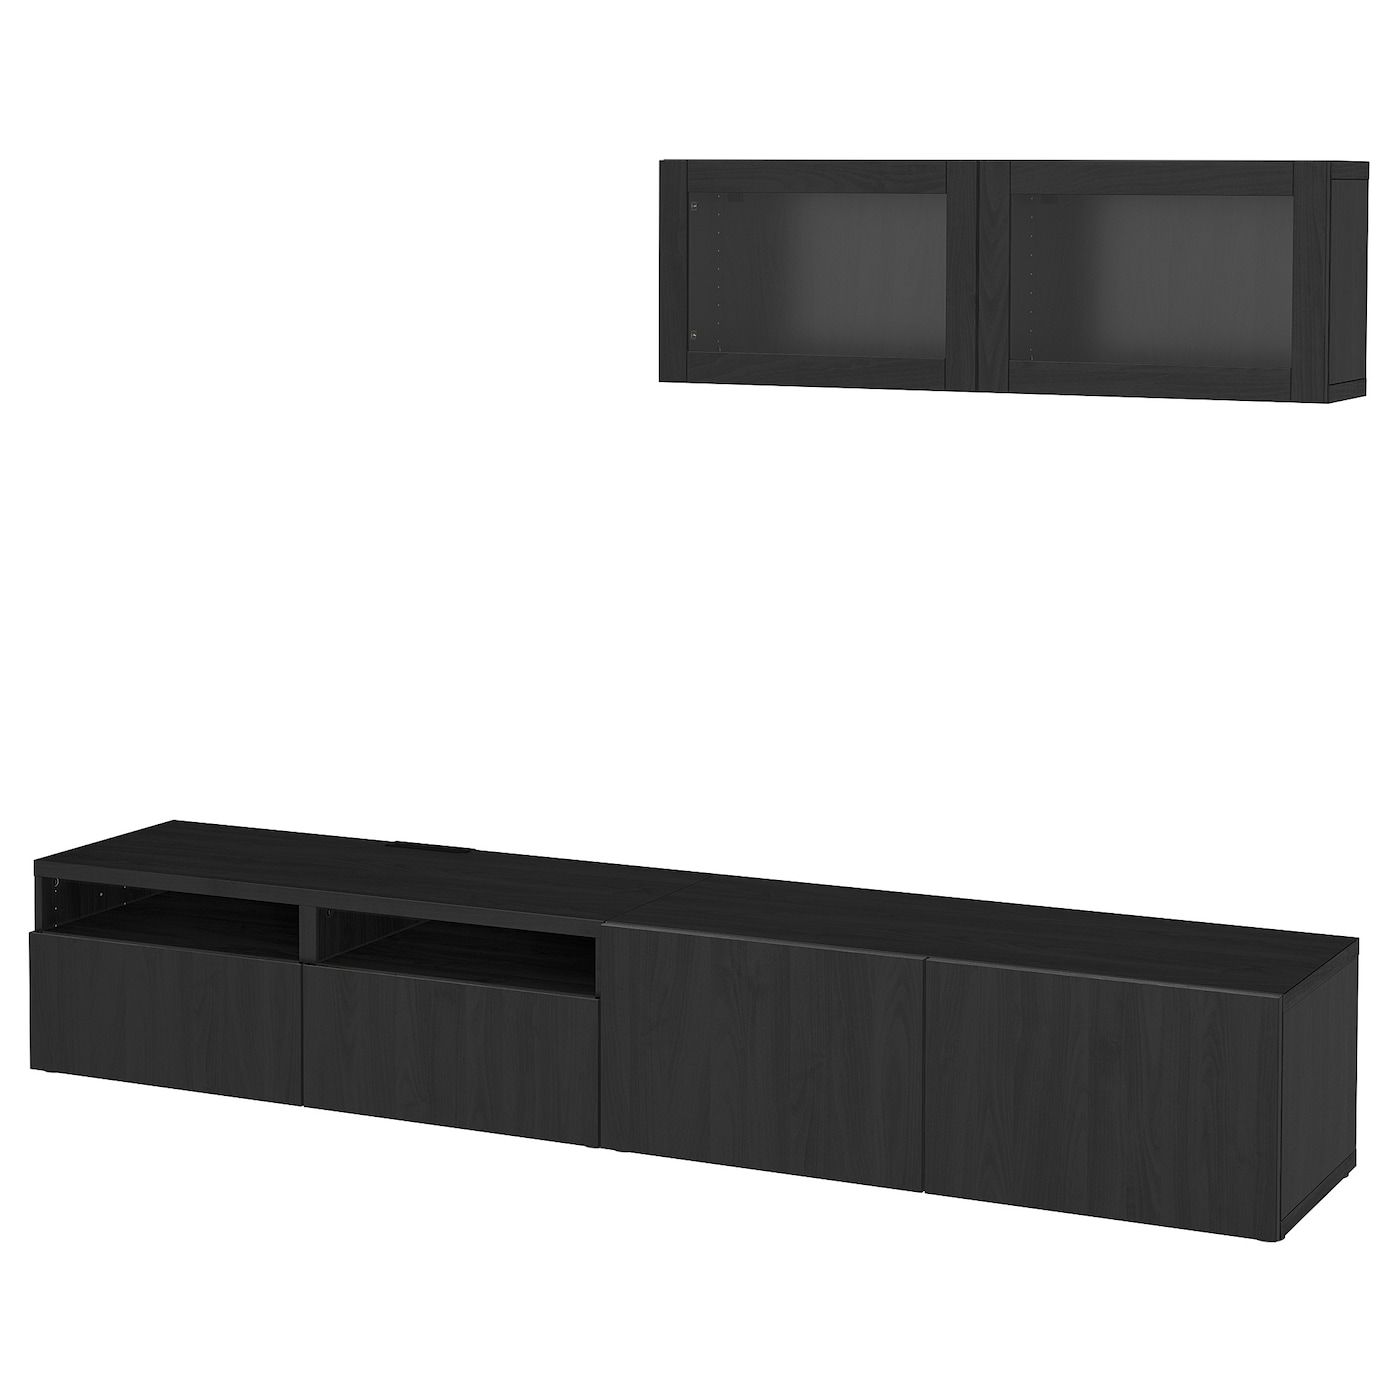 BESTÅ   TV Storage Combination/glass Doors, Lappviken, Sindvik Black Brown  Clear Glass